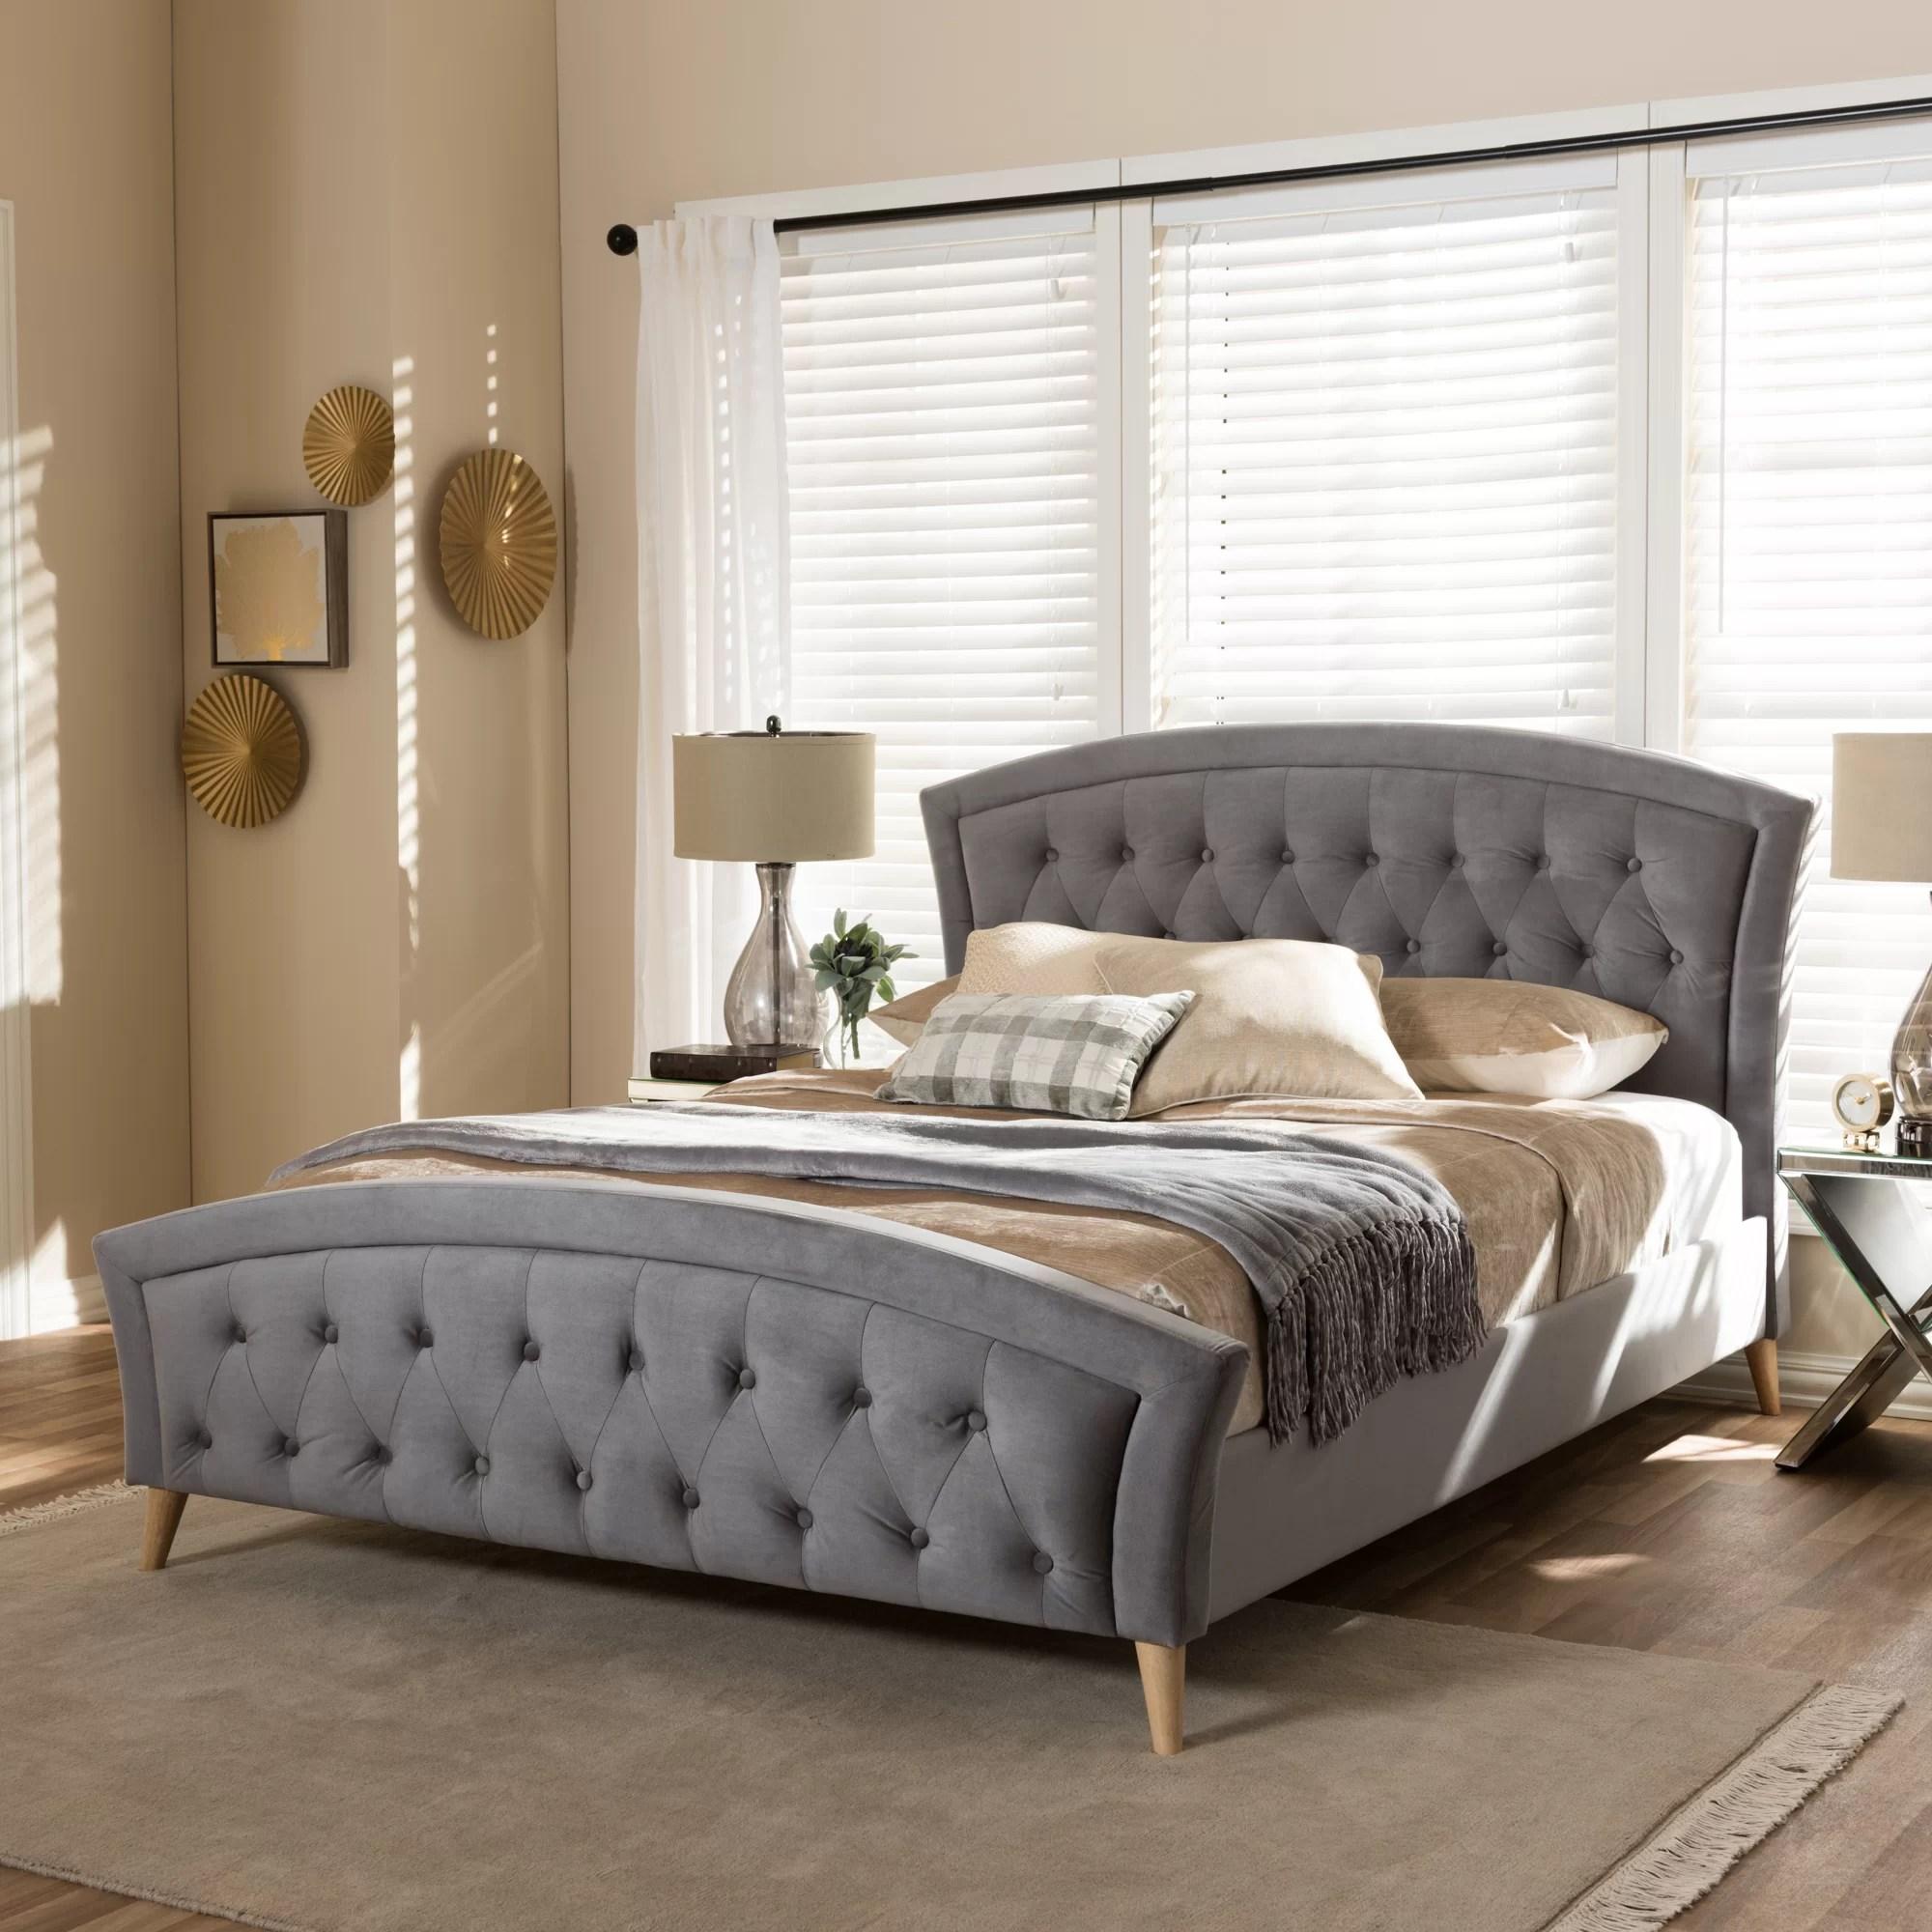 Wholesale Interiors Baxton Studio Upholstered Platform Bed